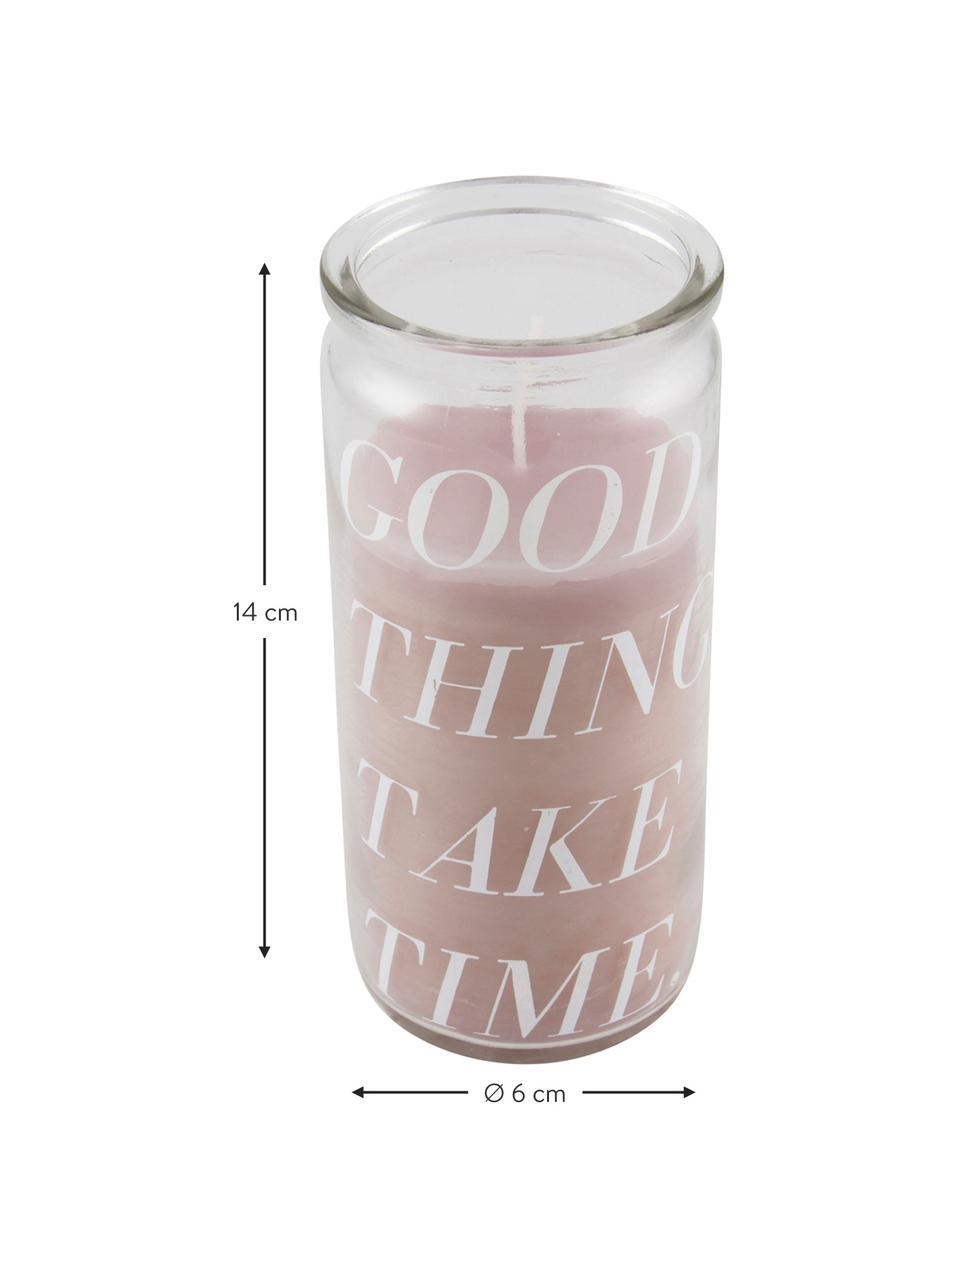 Bougie Good Things, Transparent, rose